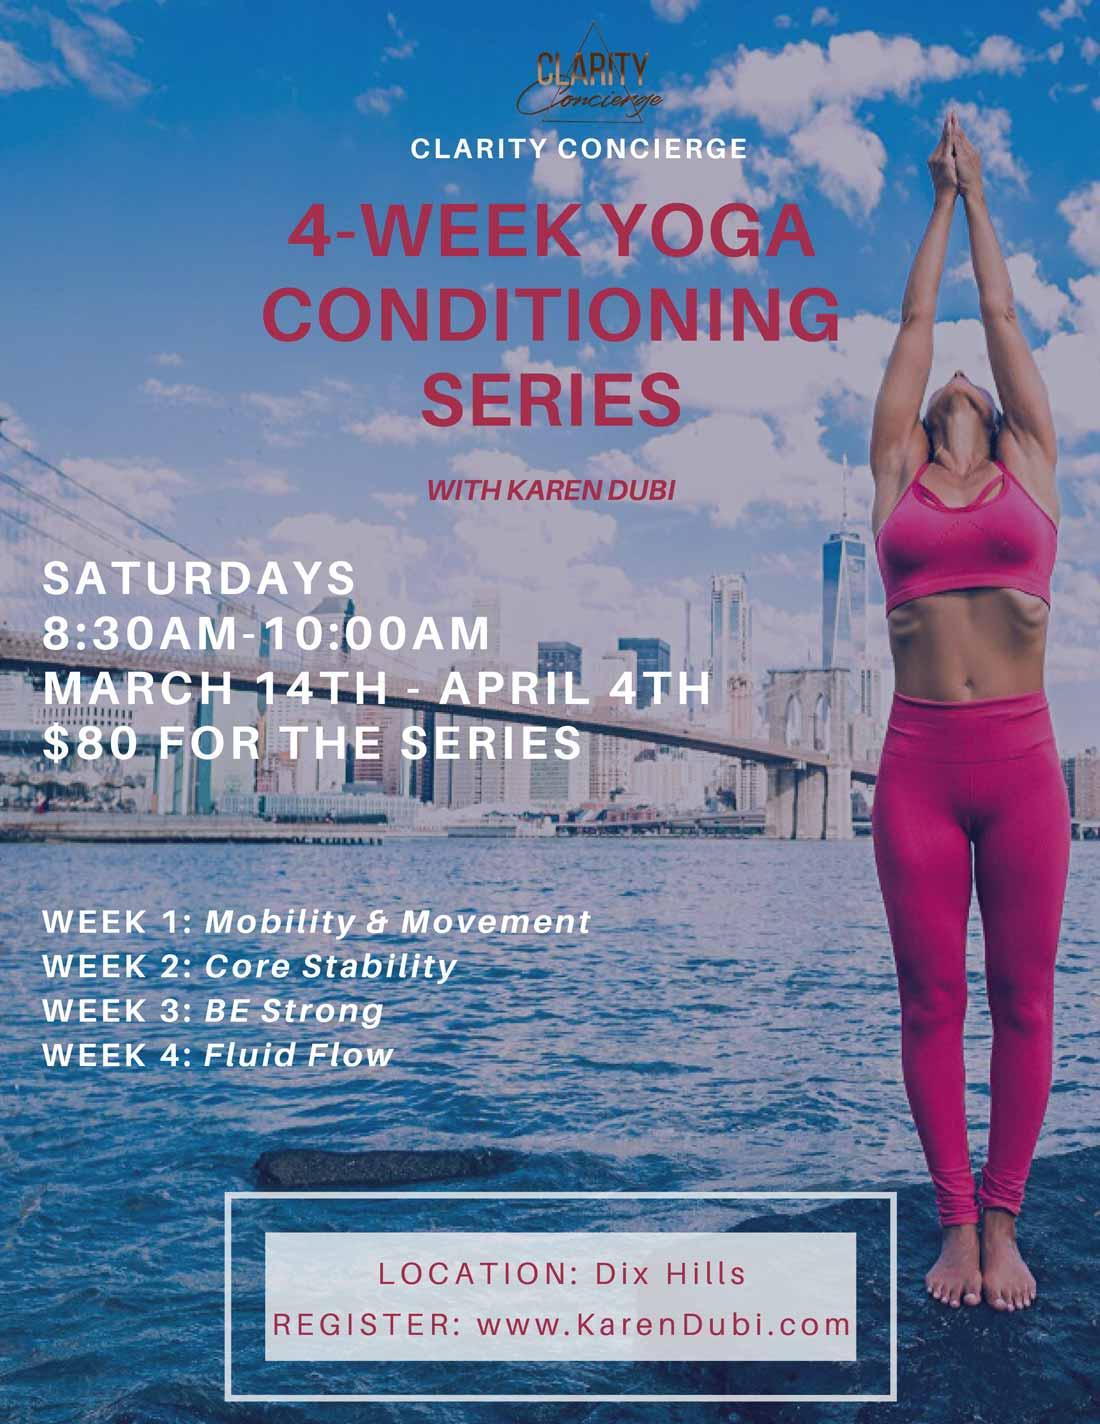 4-week Yoga Series with Karen Dubi